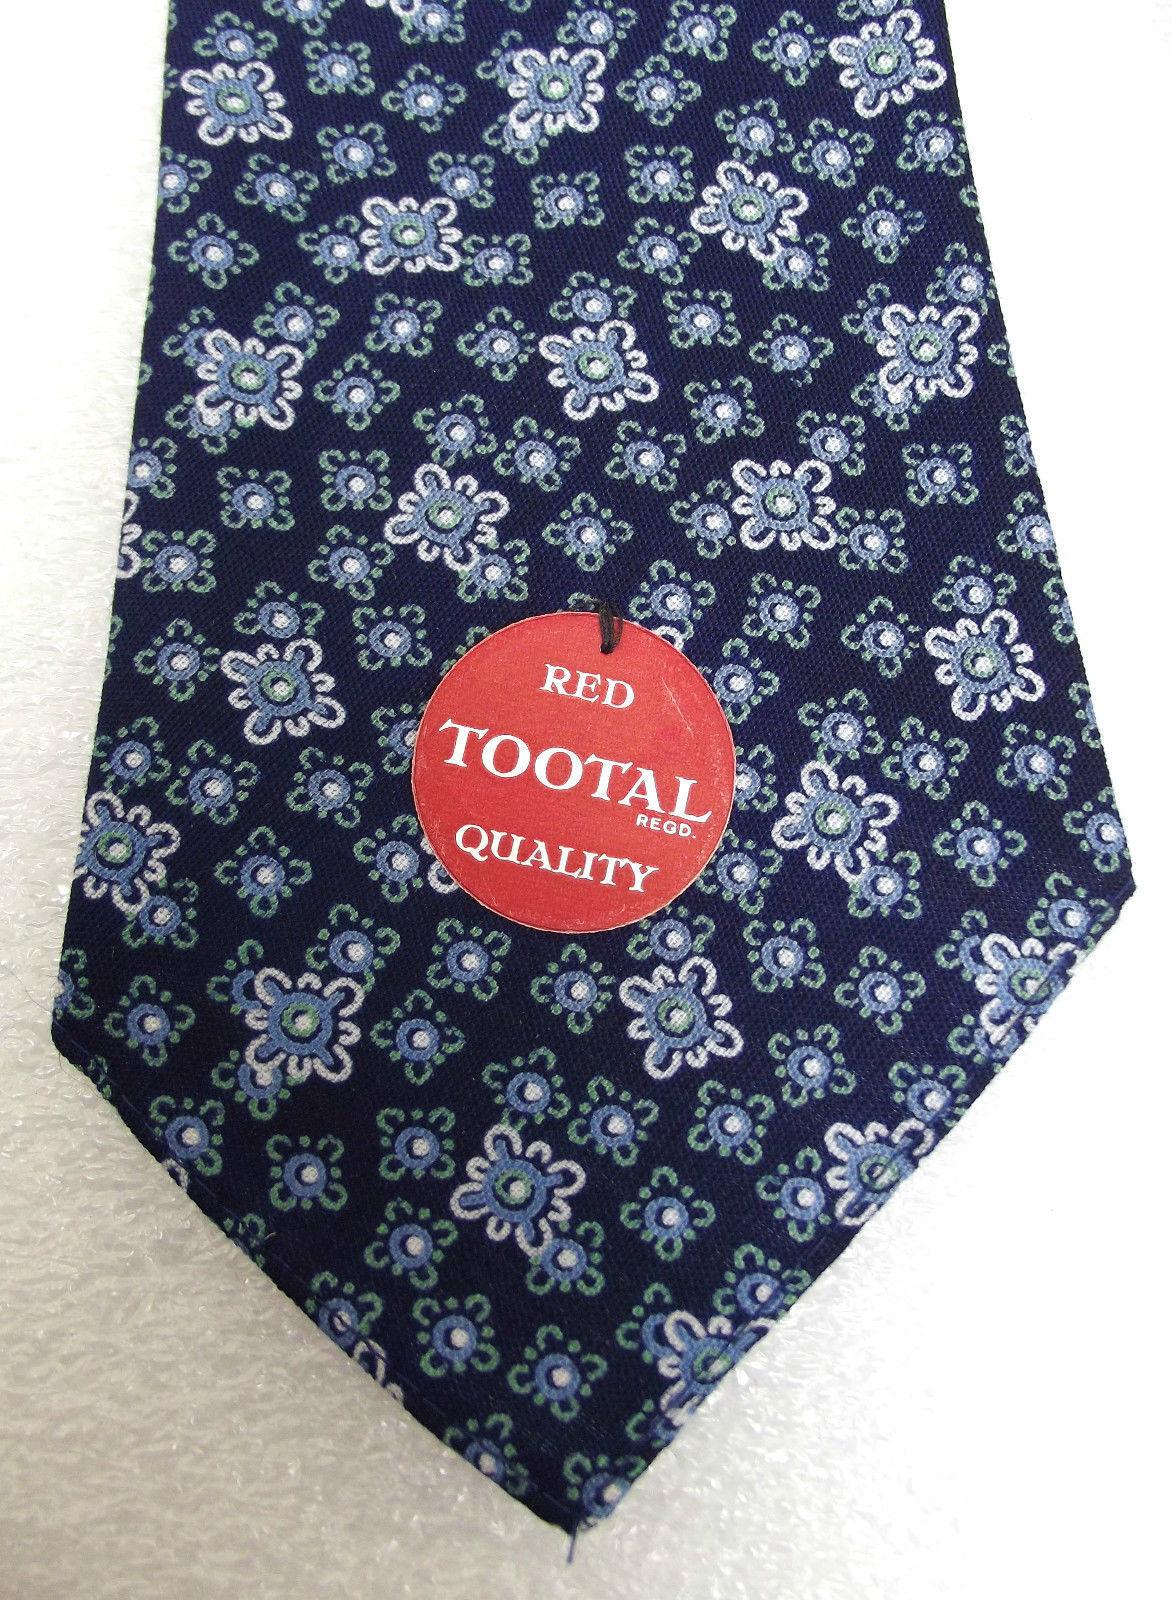 Tootal tie UNUSED vintage 1950s floral BLUE flowery tebilized cotton RED LABEL